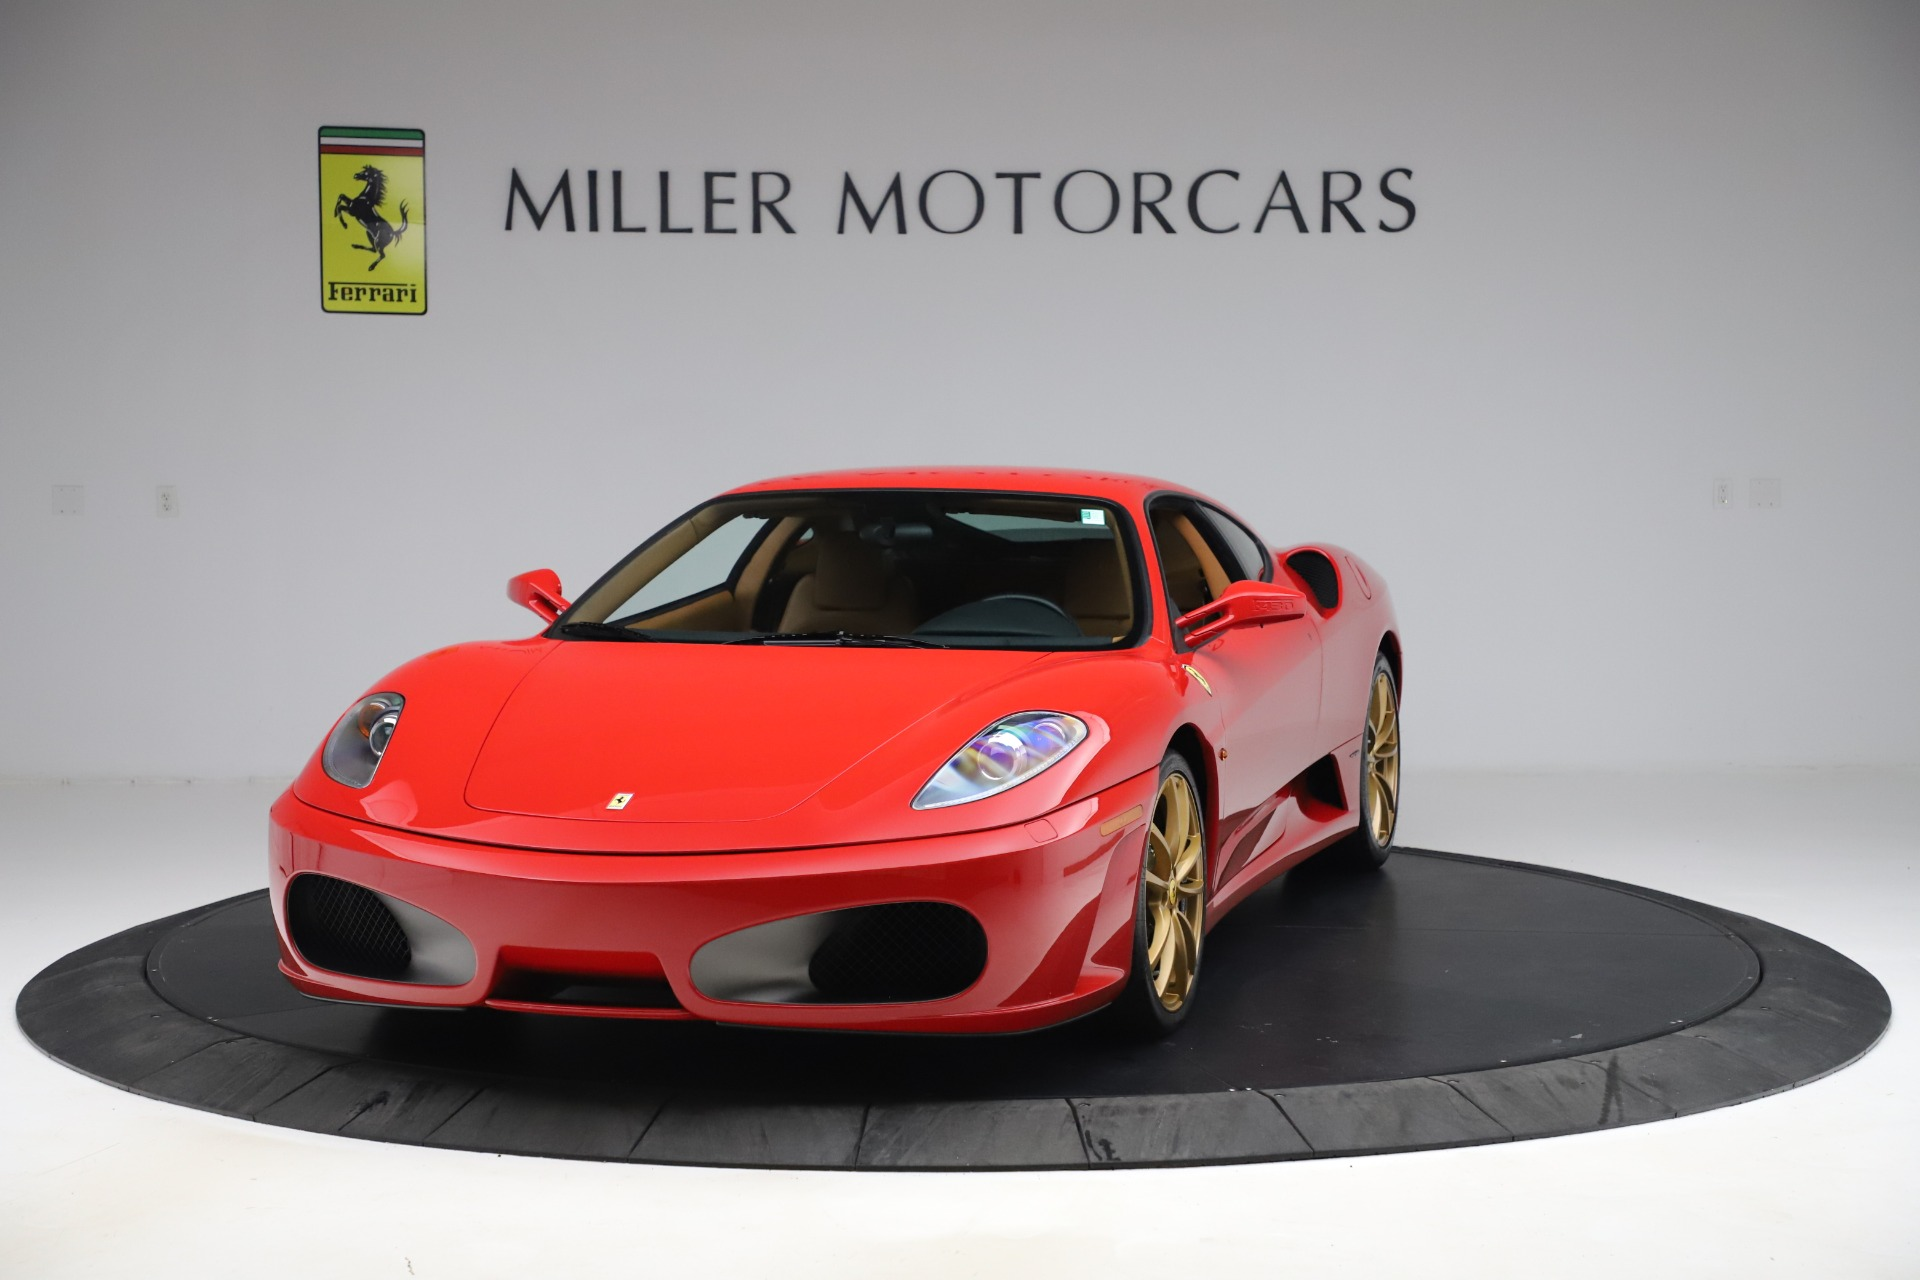 Used 2005 Ferrari F430 for sale $115,900 at Aston Martin of Greenwich in Greenwich CT 06830 1